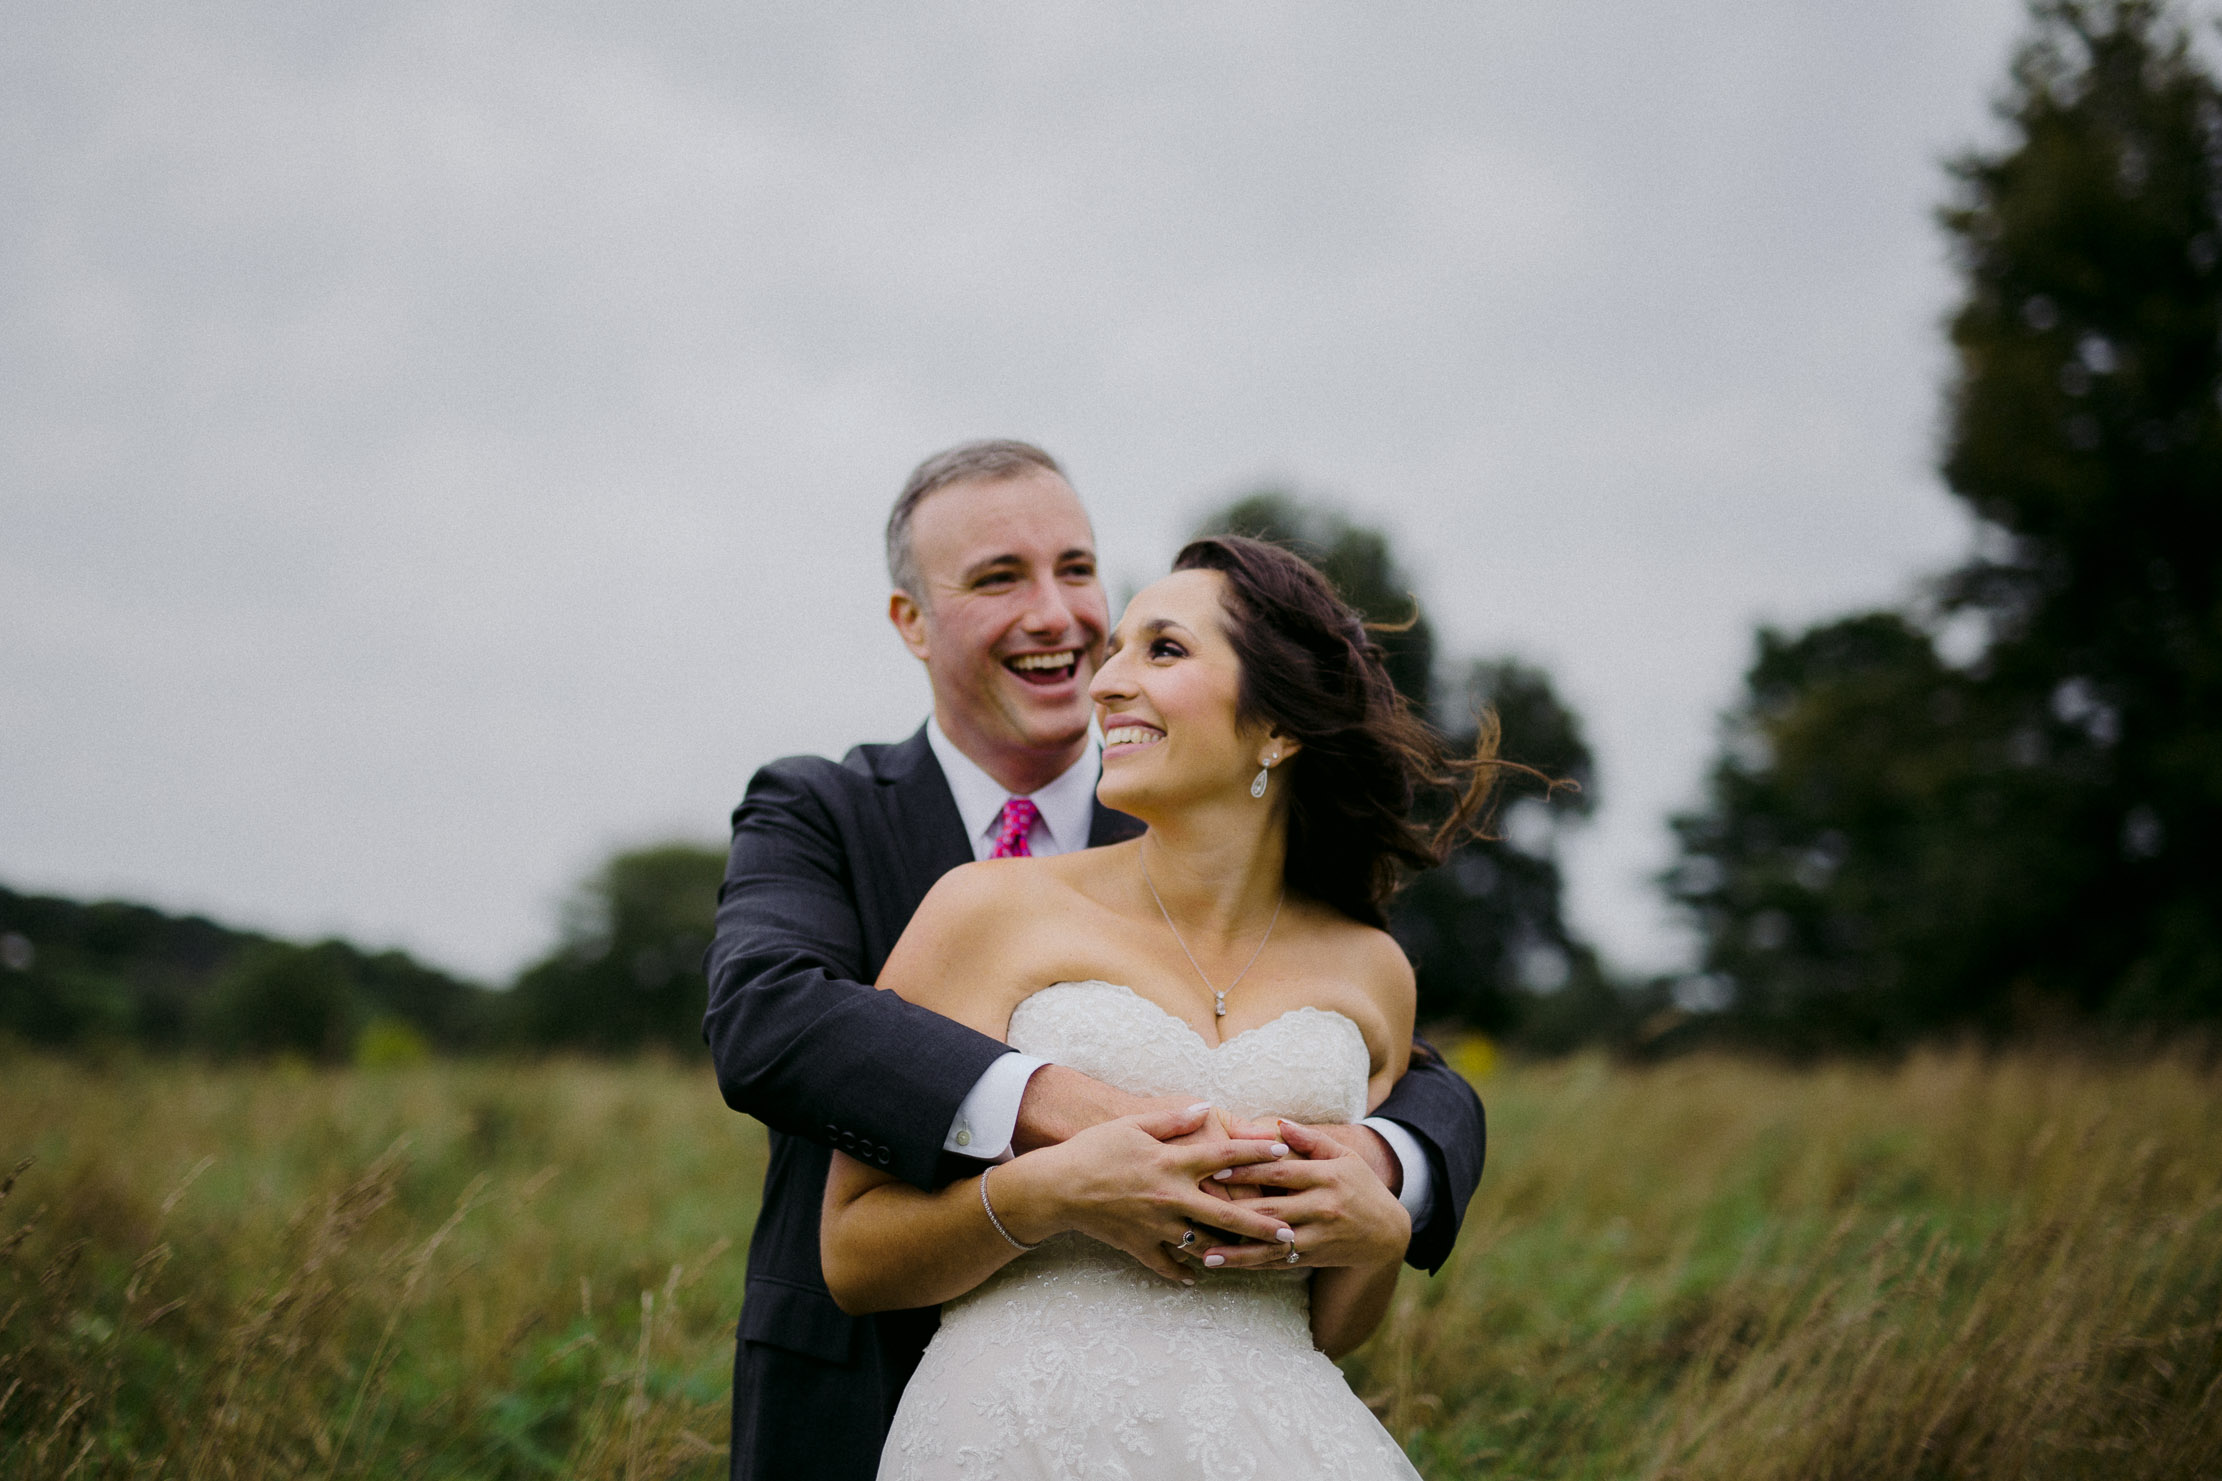 Wings-Castle-Millbrook-NY-Upstate-Wedding-Photographer-1058.jpg